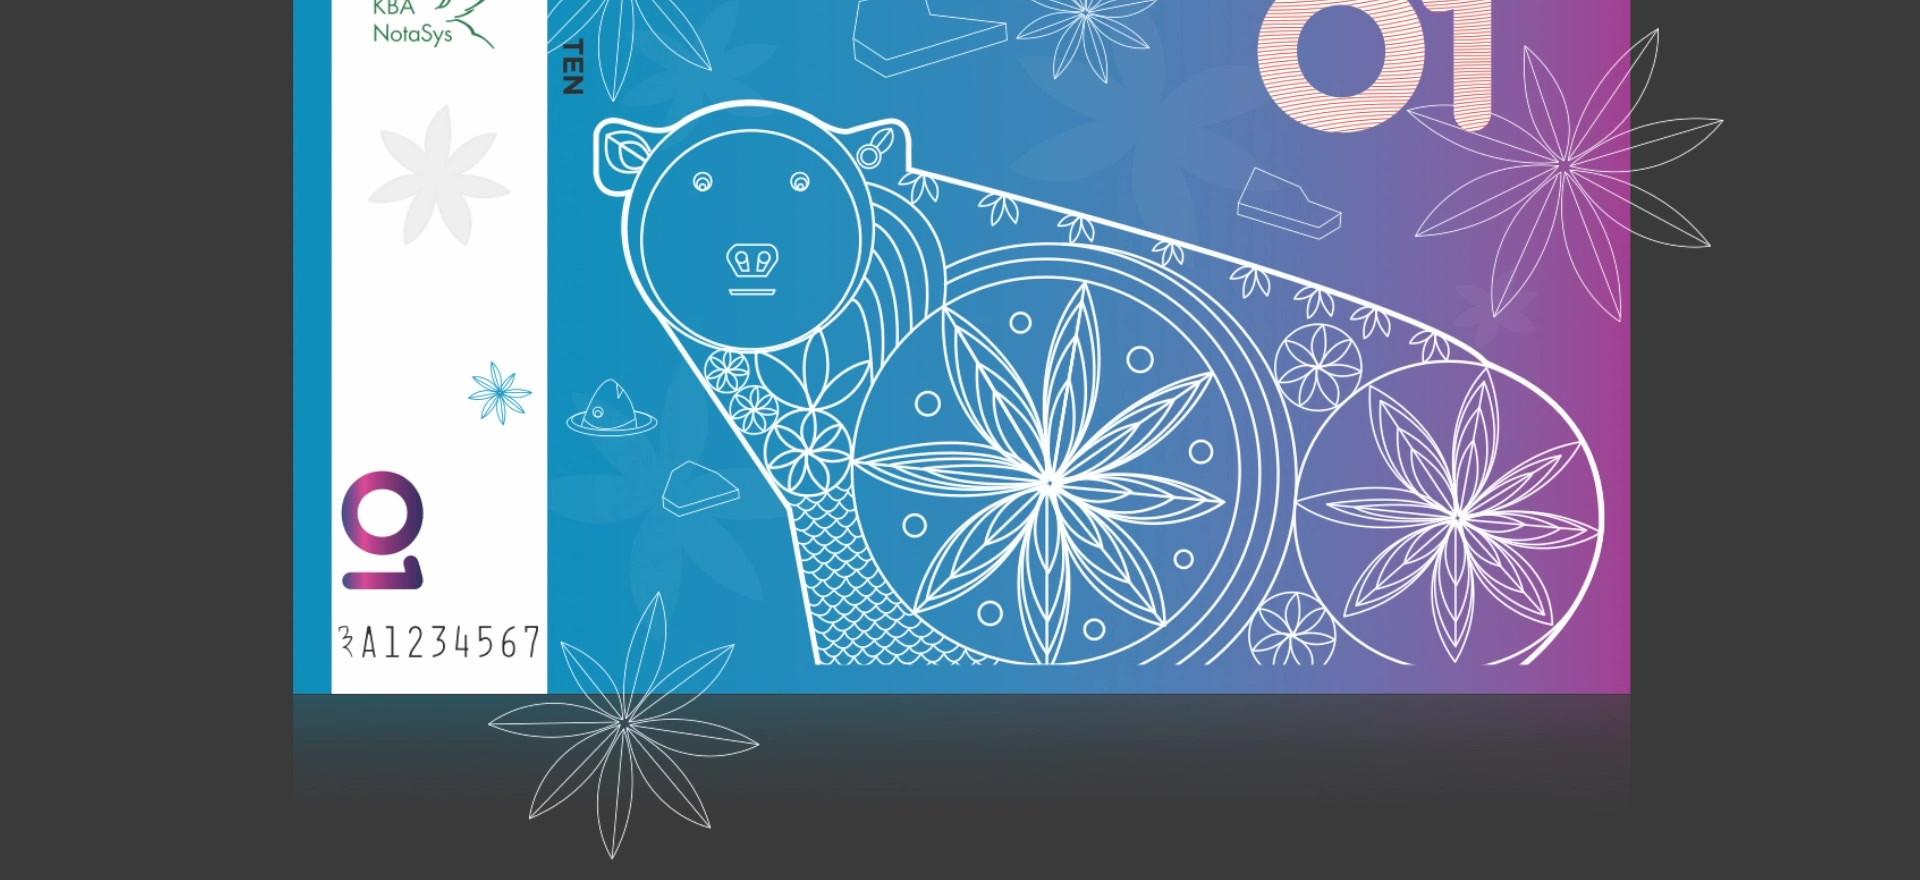 Front Banknotes Design